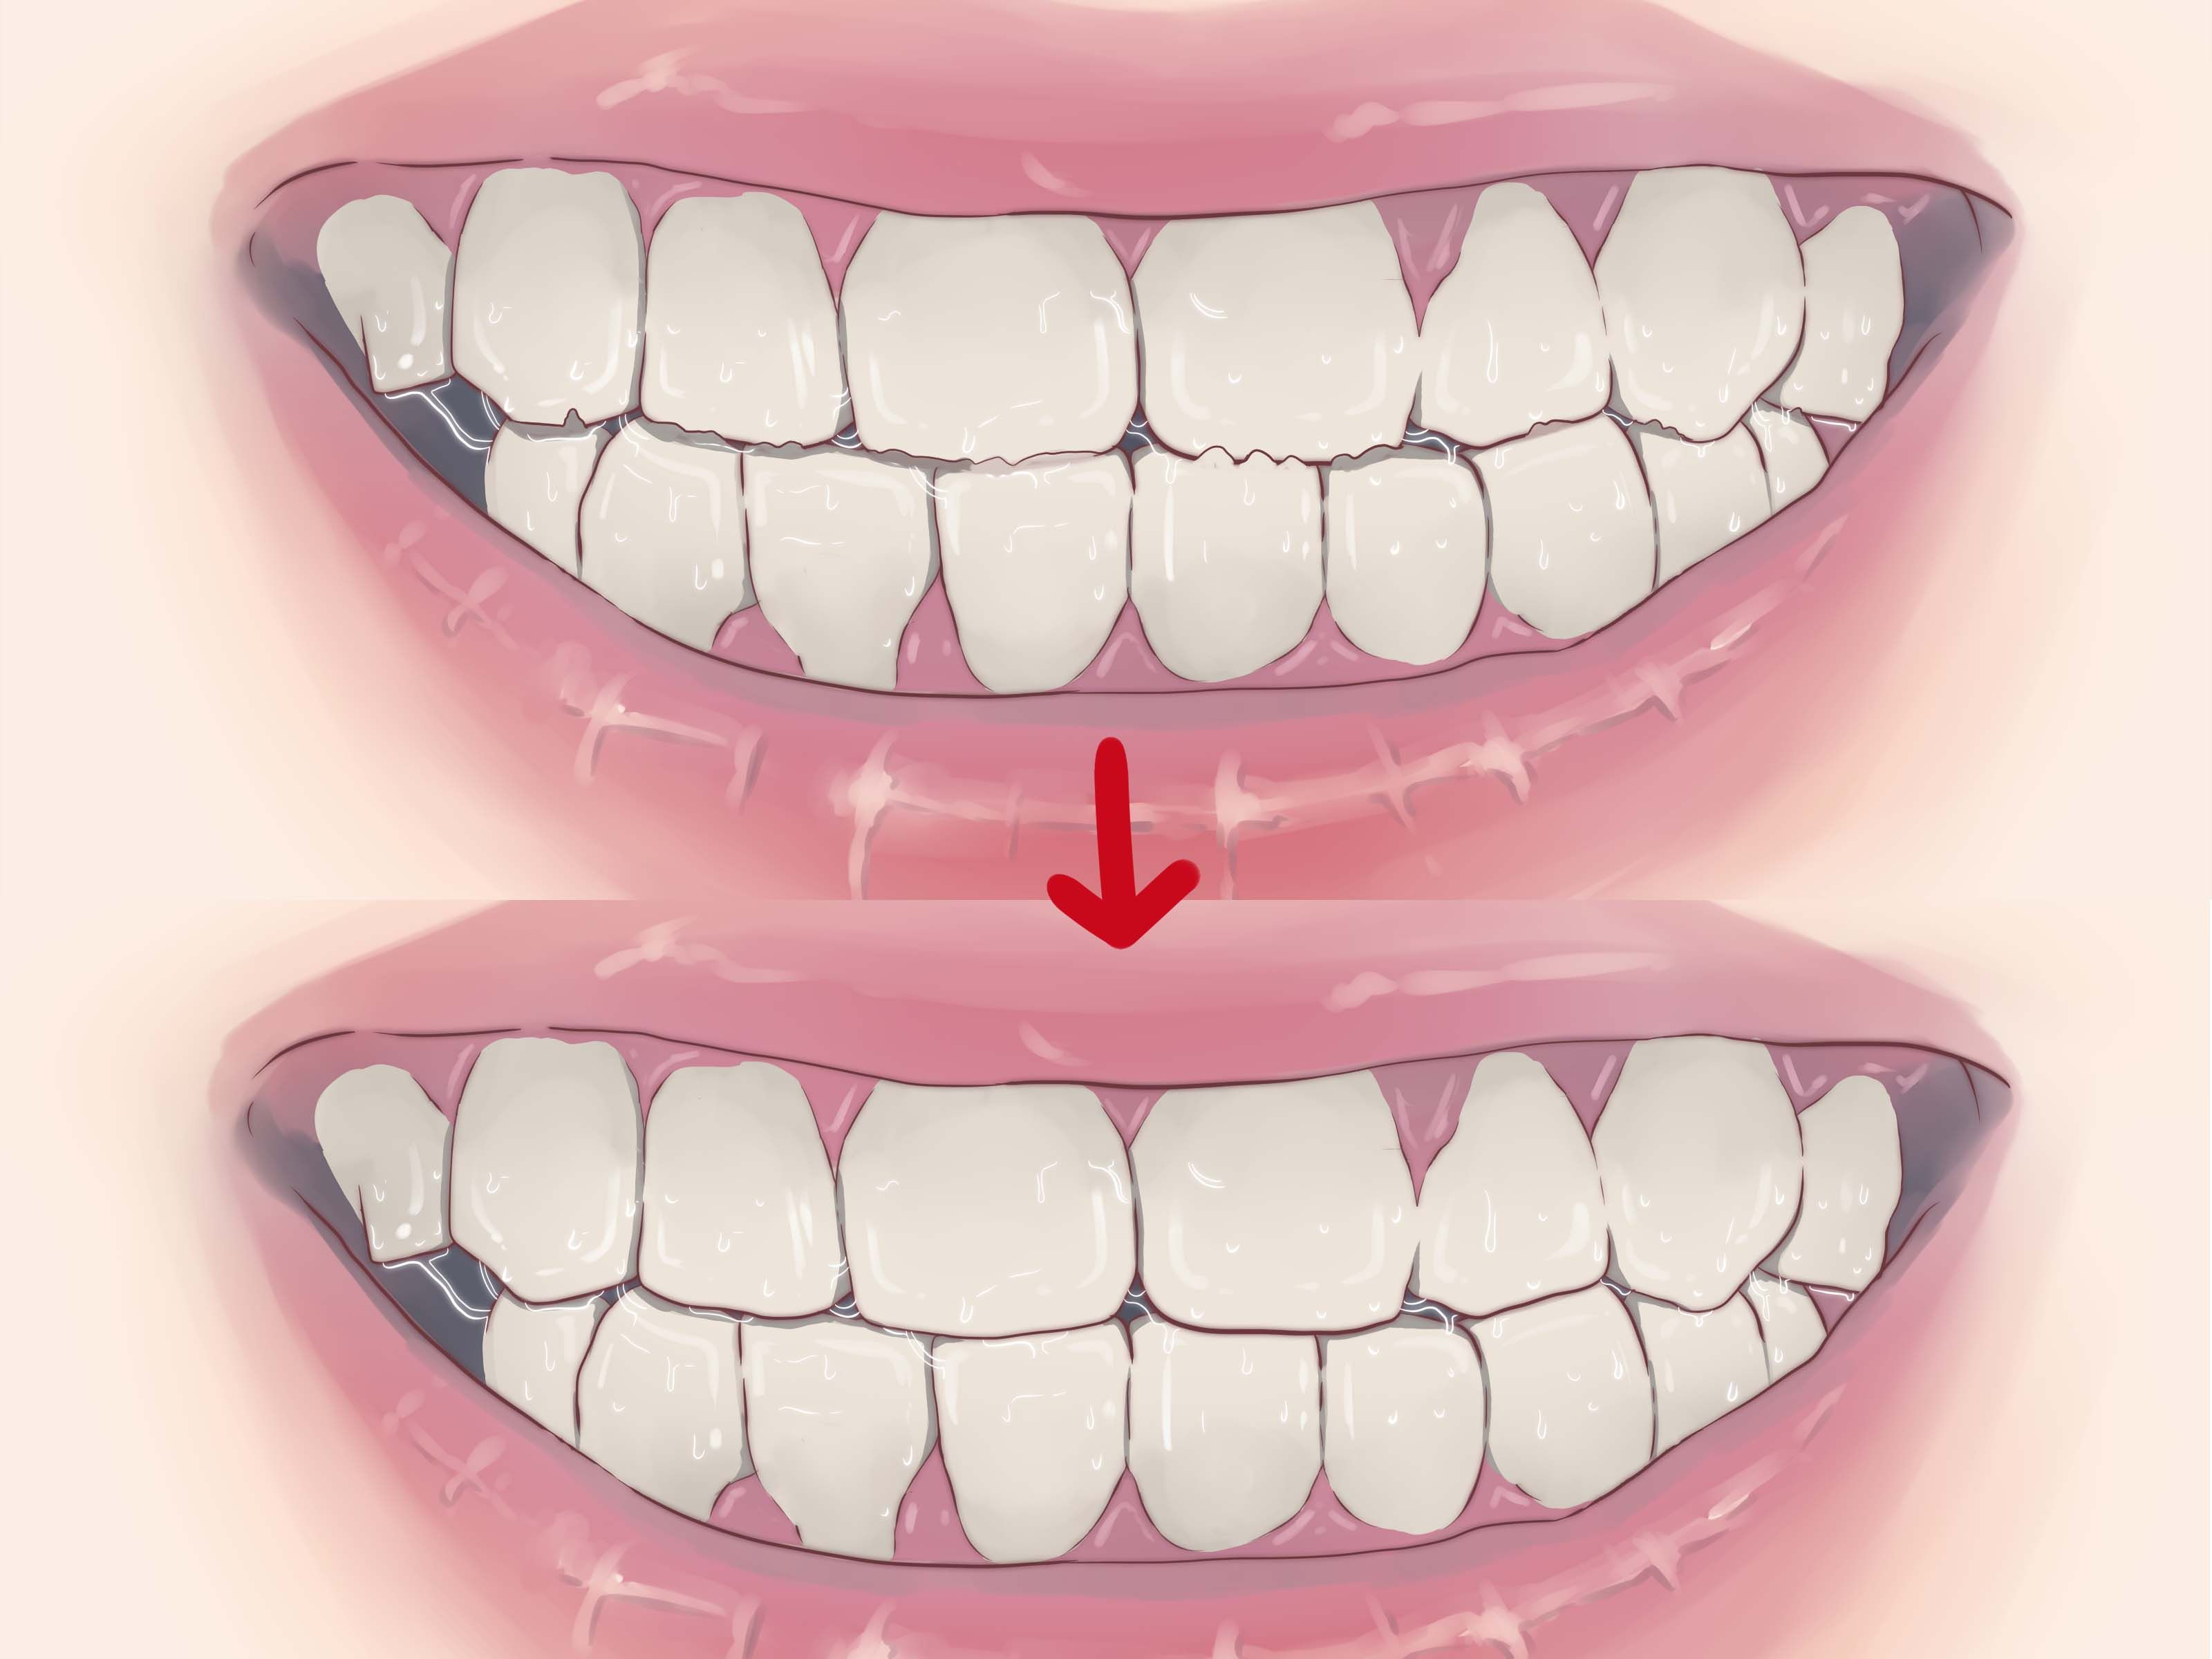 How To Get My Kid To Stop Grinding Teeth